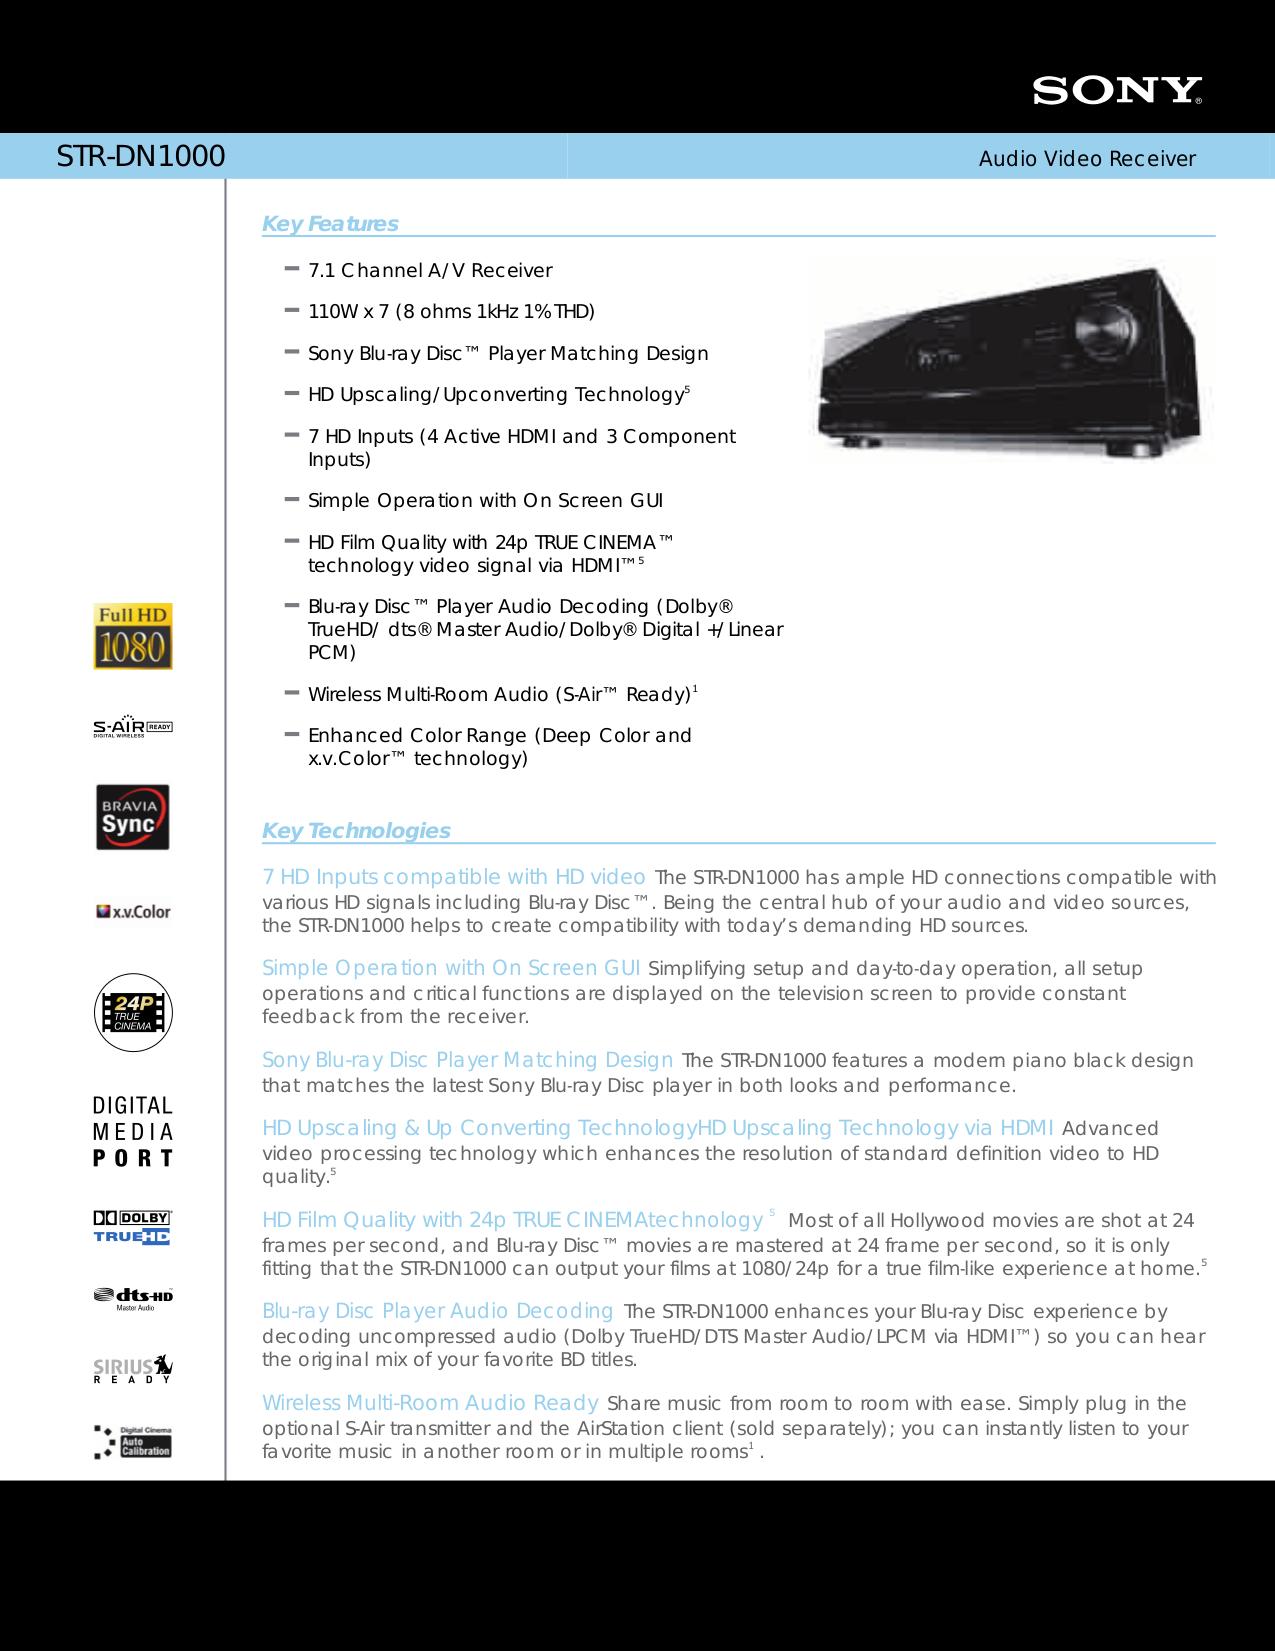 sony str dn1000 manual how to and user guide instructions u2022 rh taxibermuda co str dn1000 manual pdf str-dn1000 remote